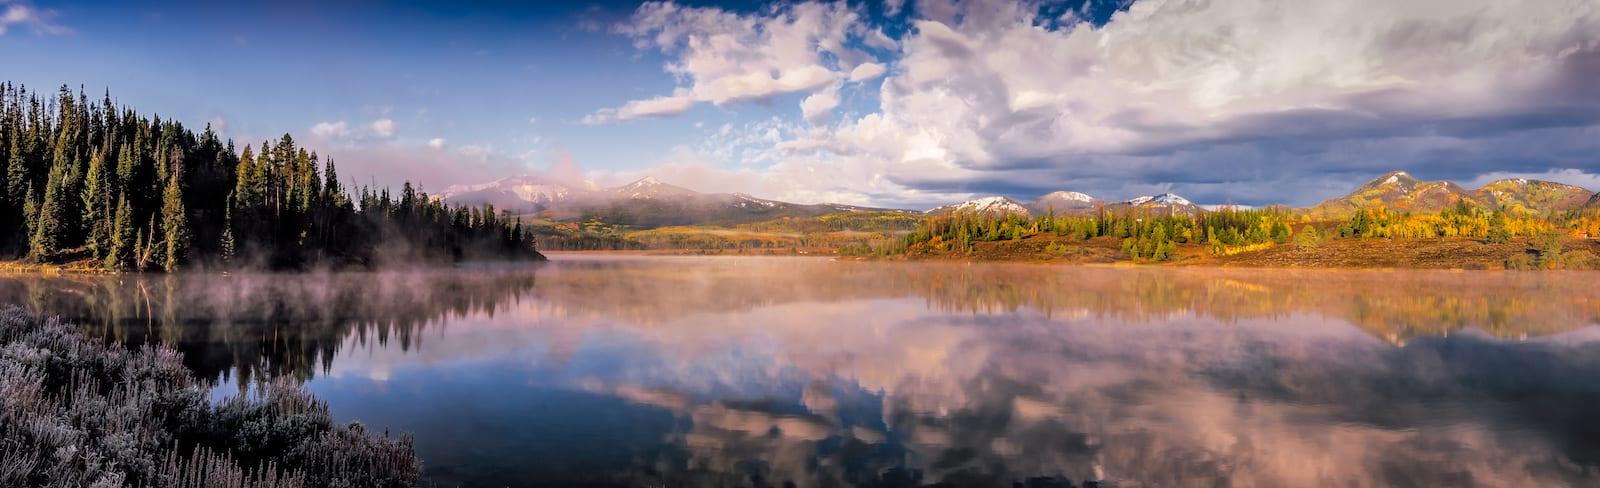 Buffalo Pass Lake Morning Fog Steamboat Springs CO